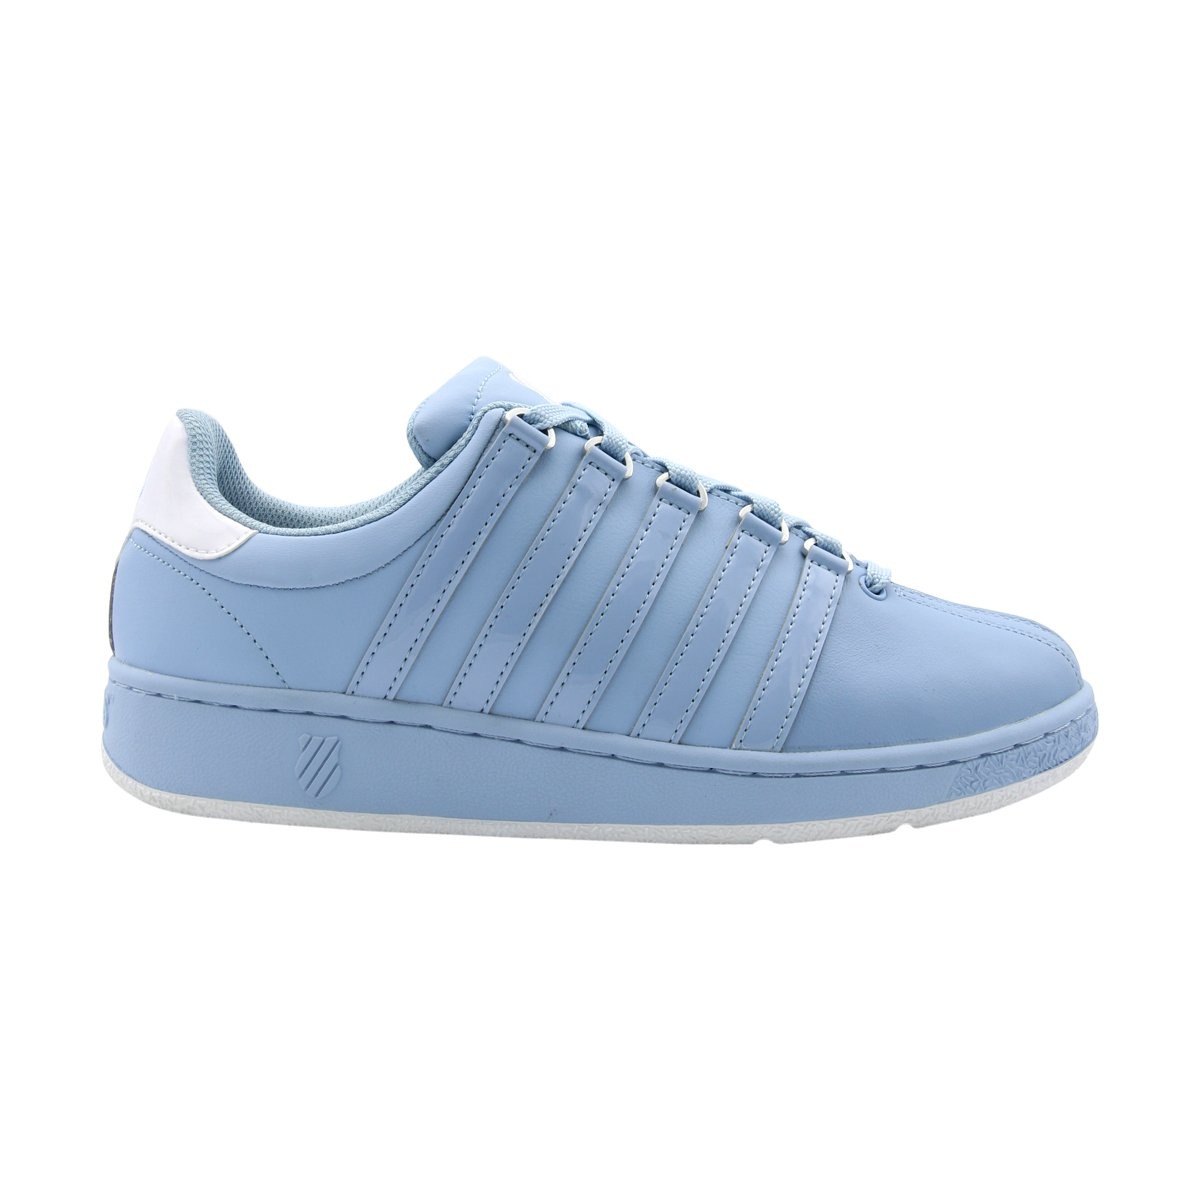 K-Swiss Women's Classic Vn Sneaker B01LYYTUGL 6.5 B(M) US|Dream Blue/White